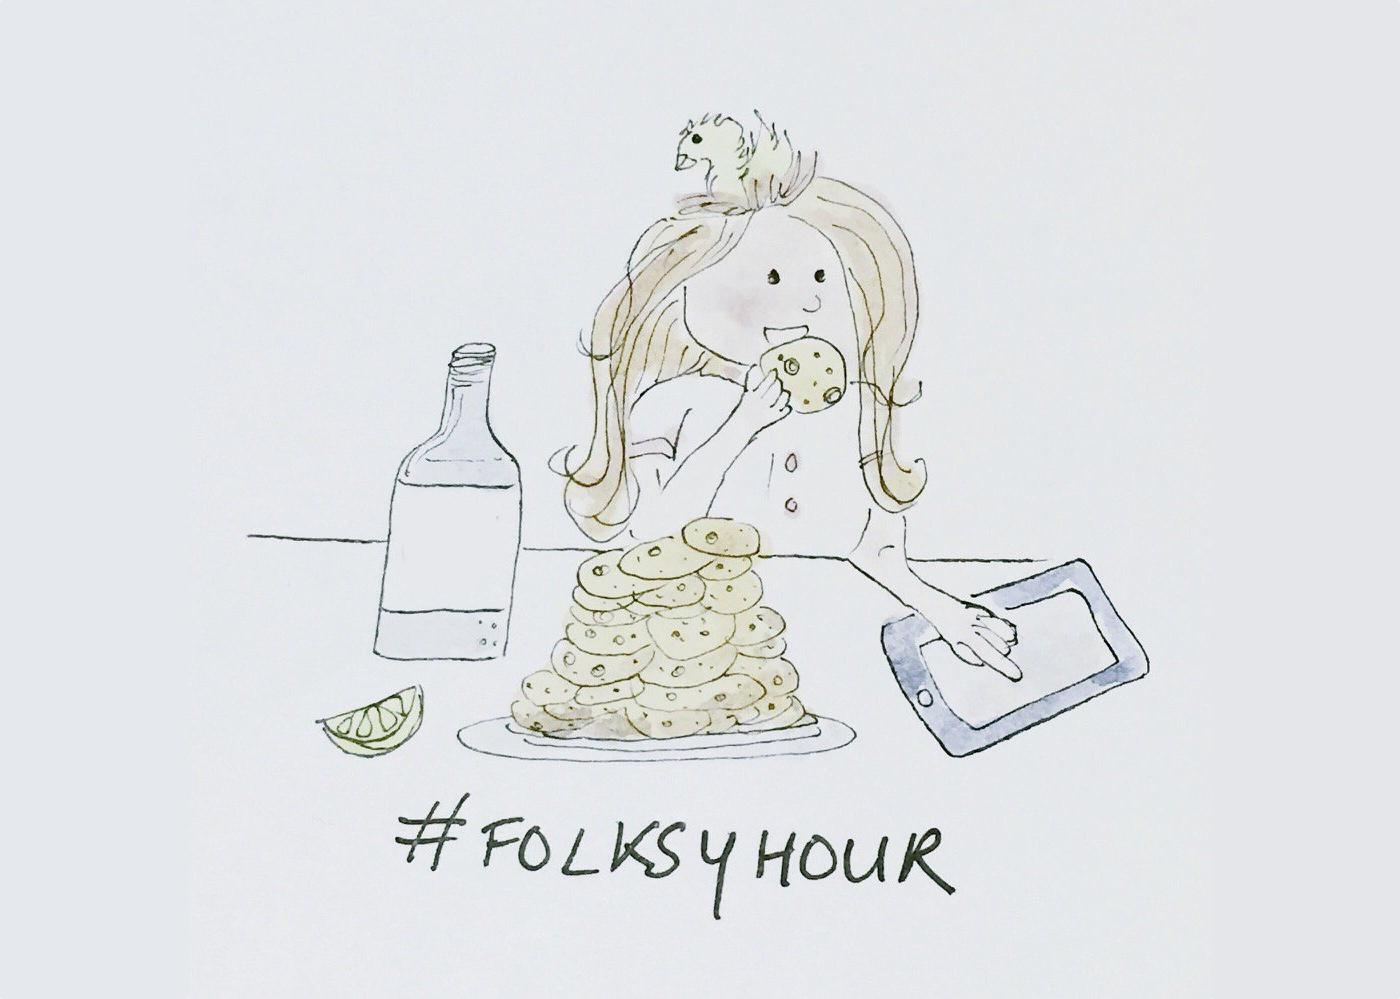 folksyhour, folksy hour, Ellie Press,